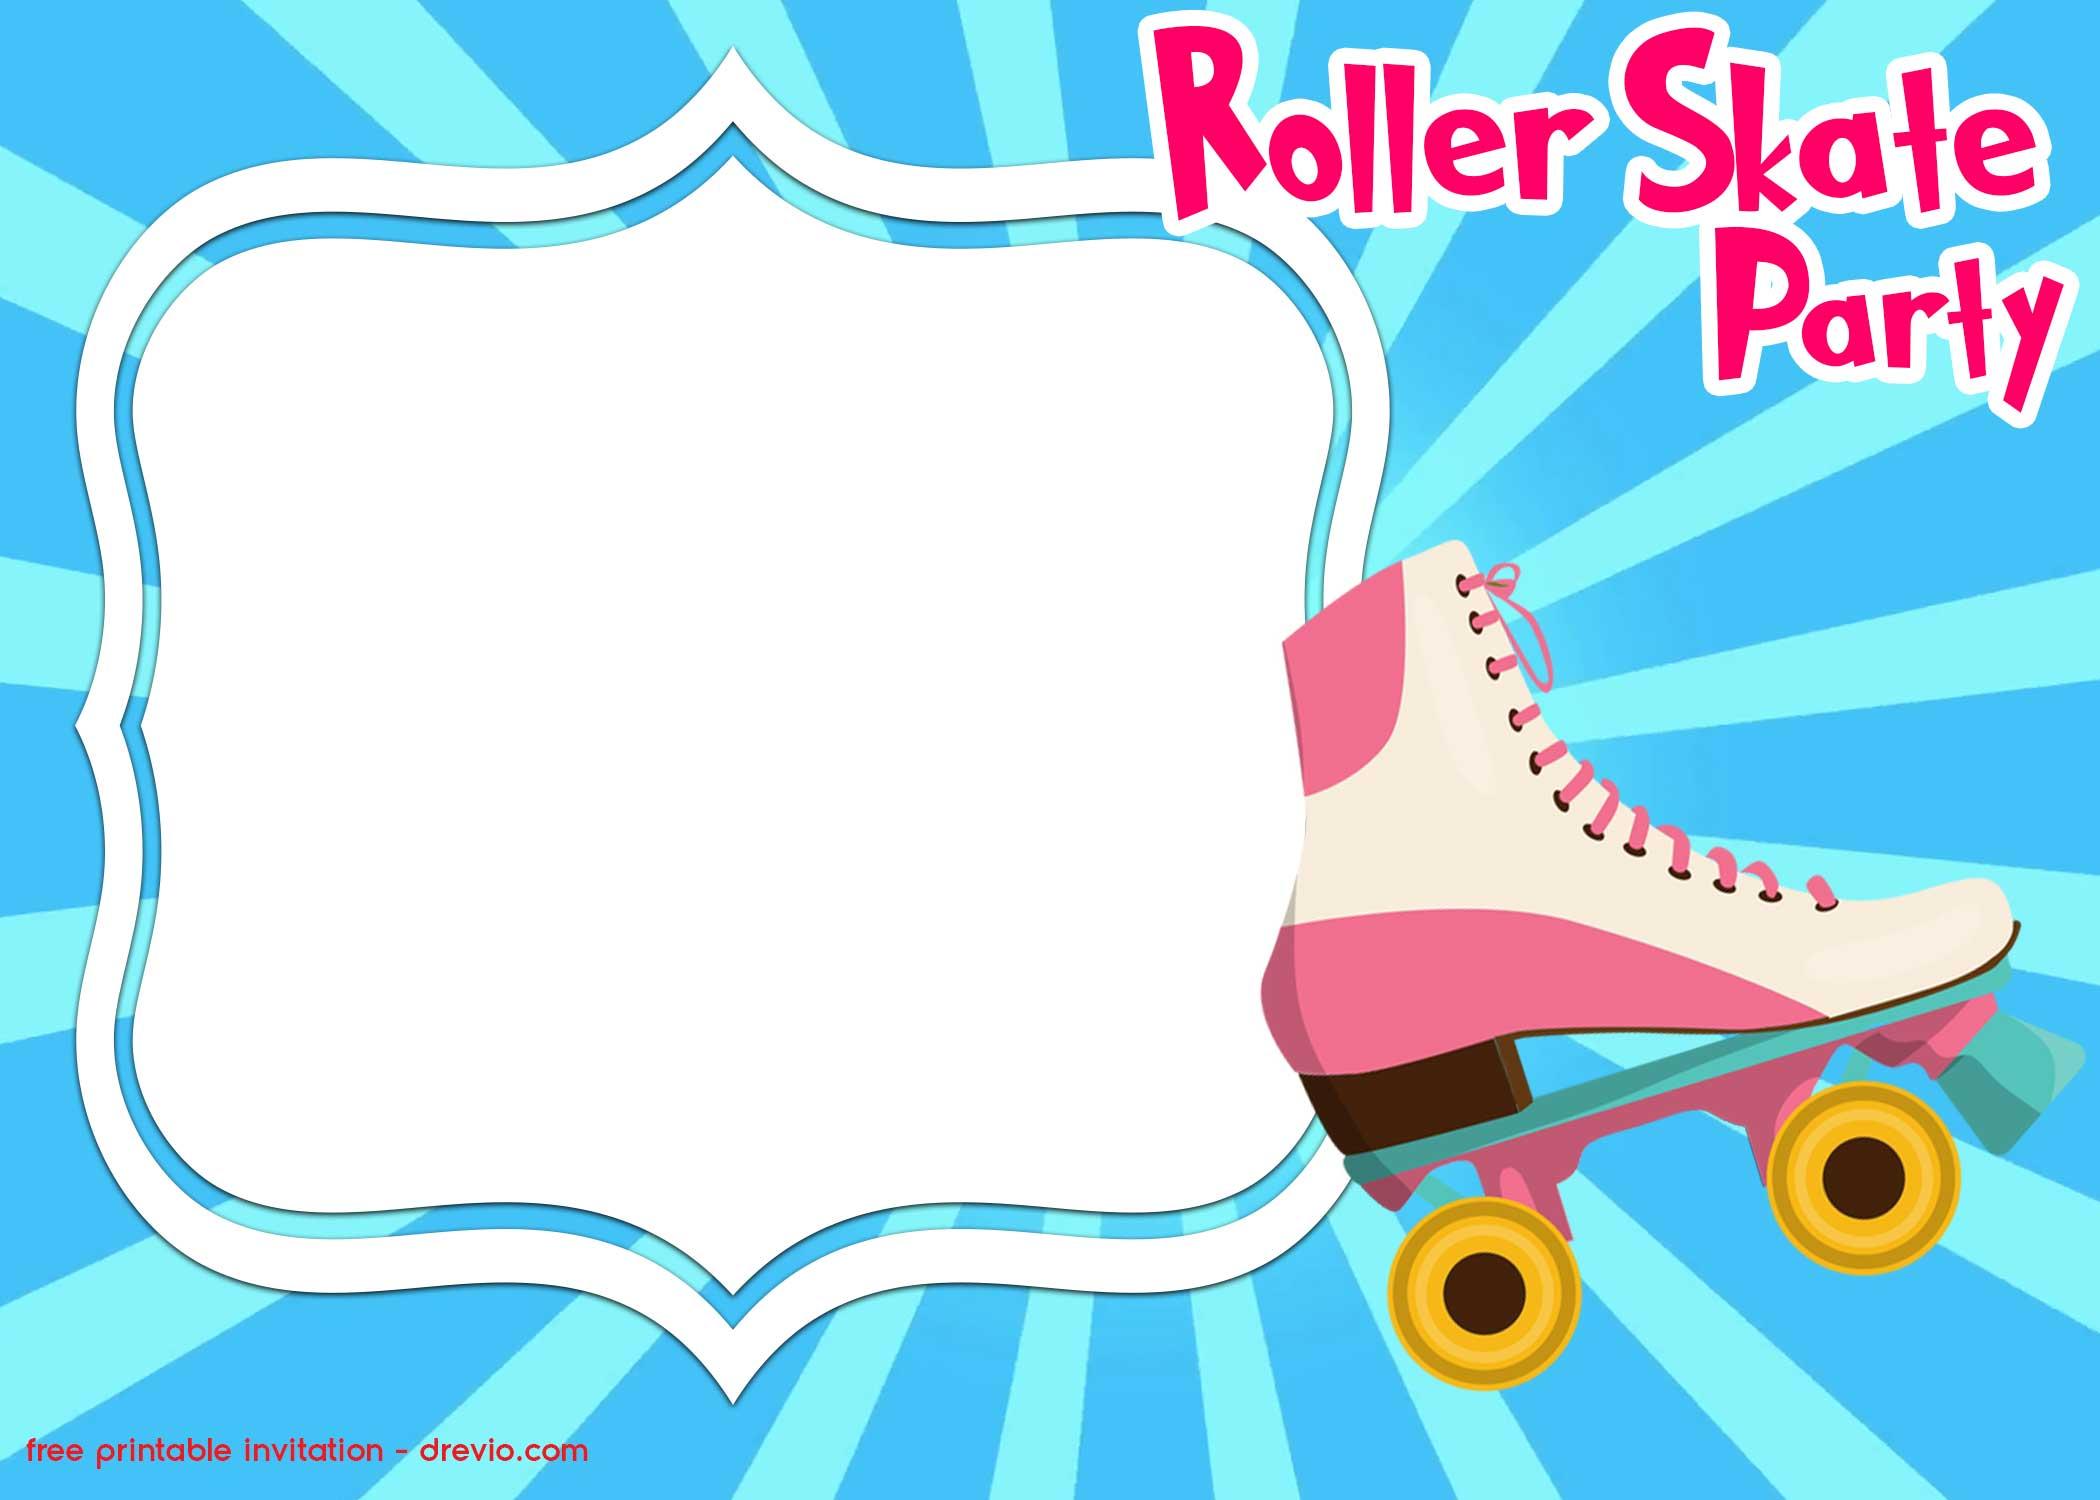 free printable roller skating